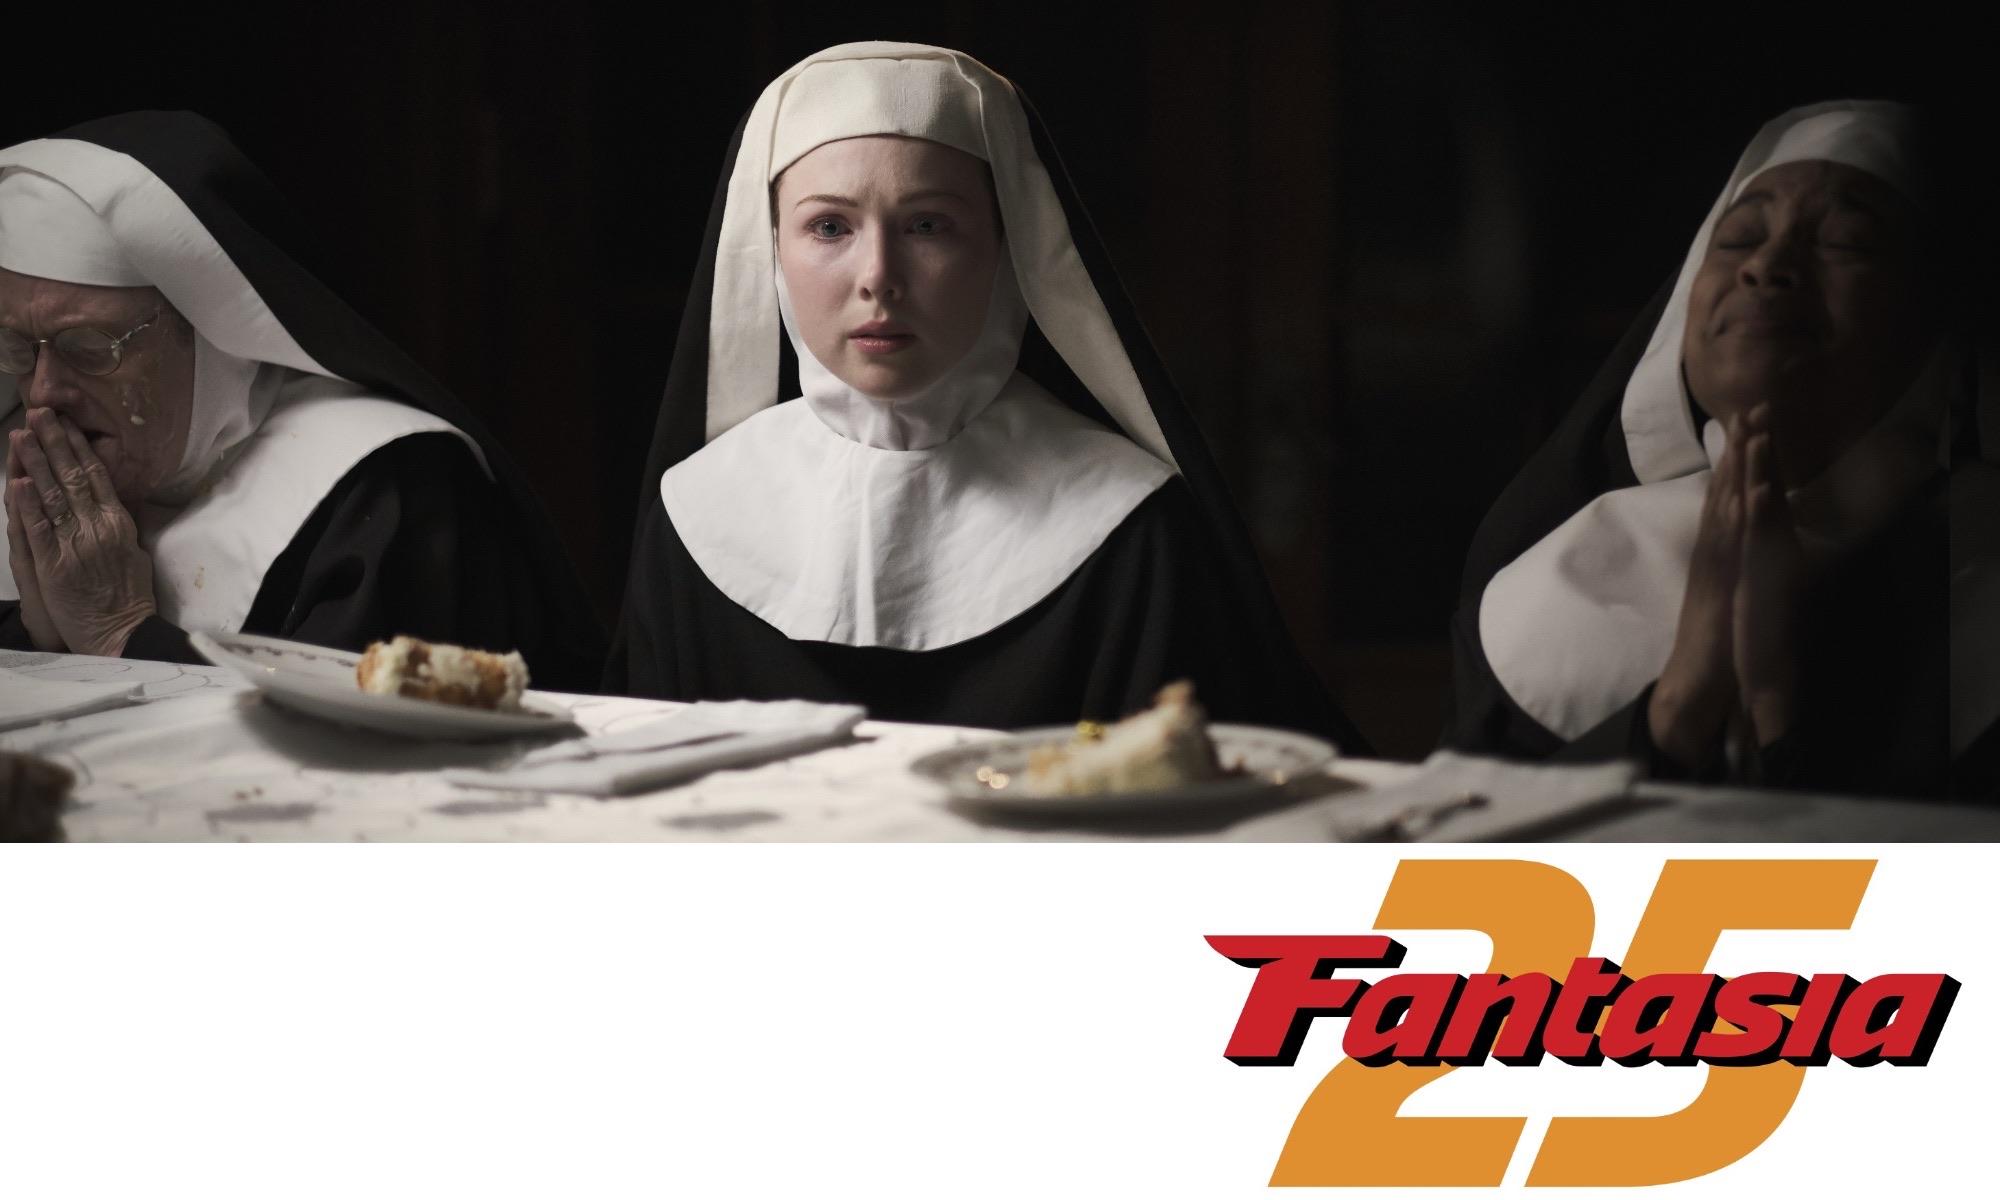 Agnes / Fantasia